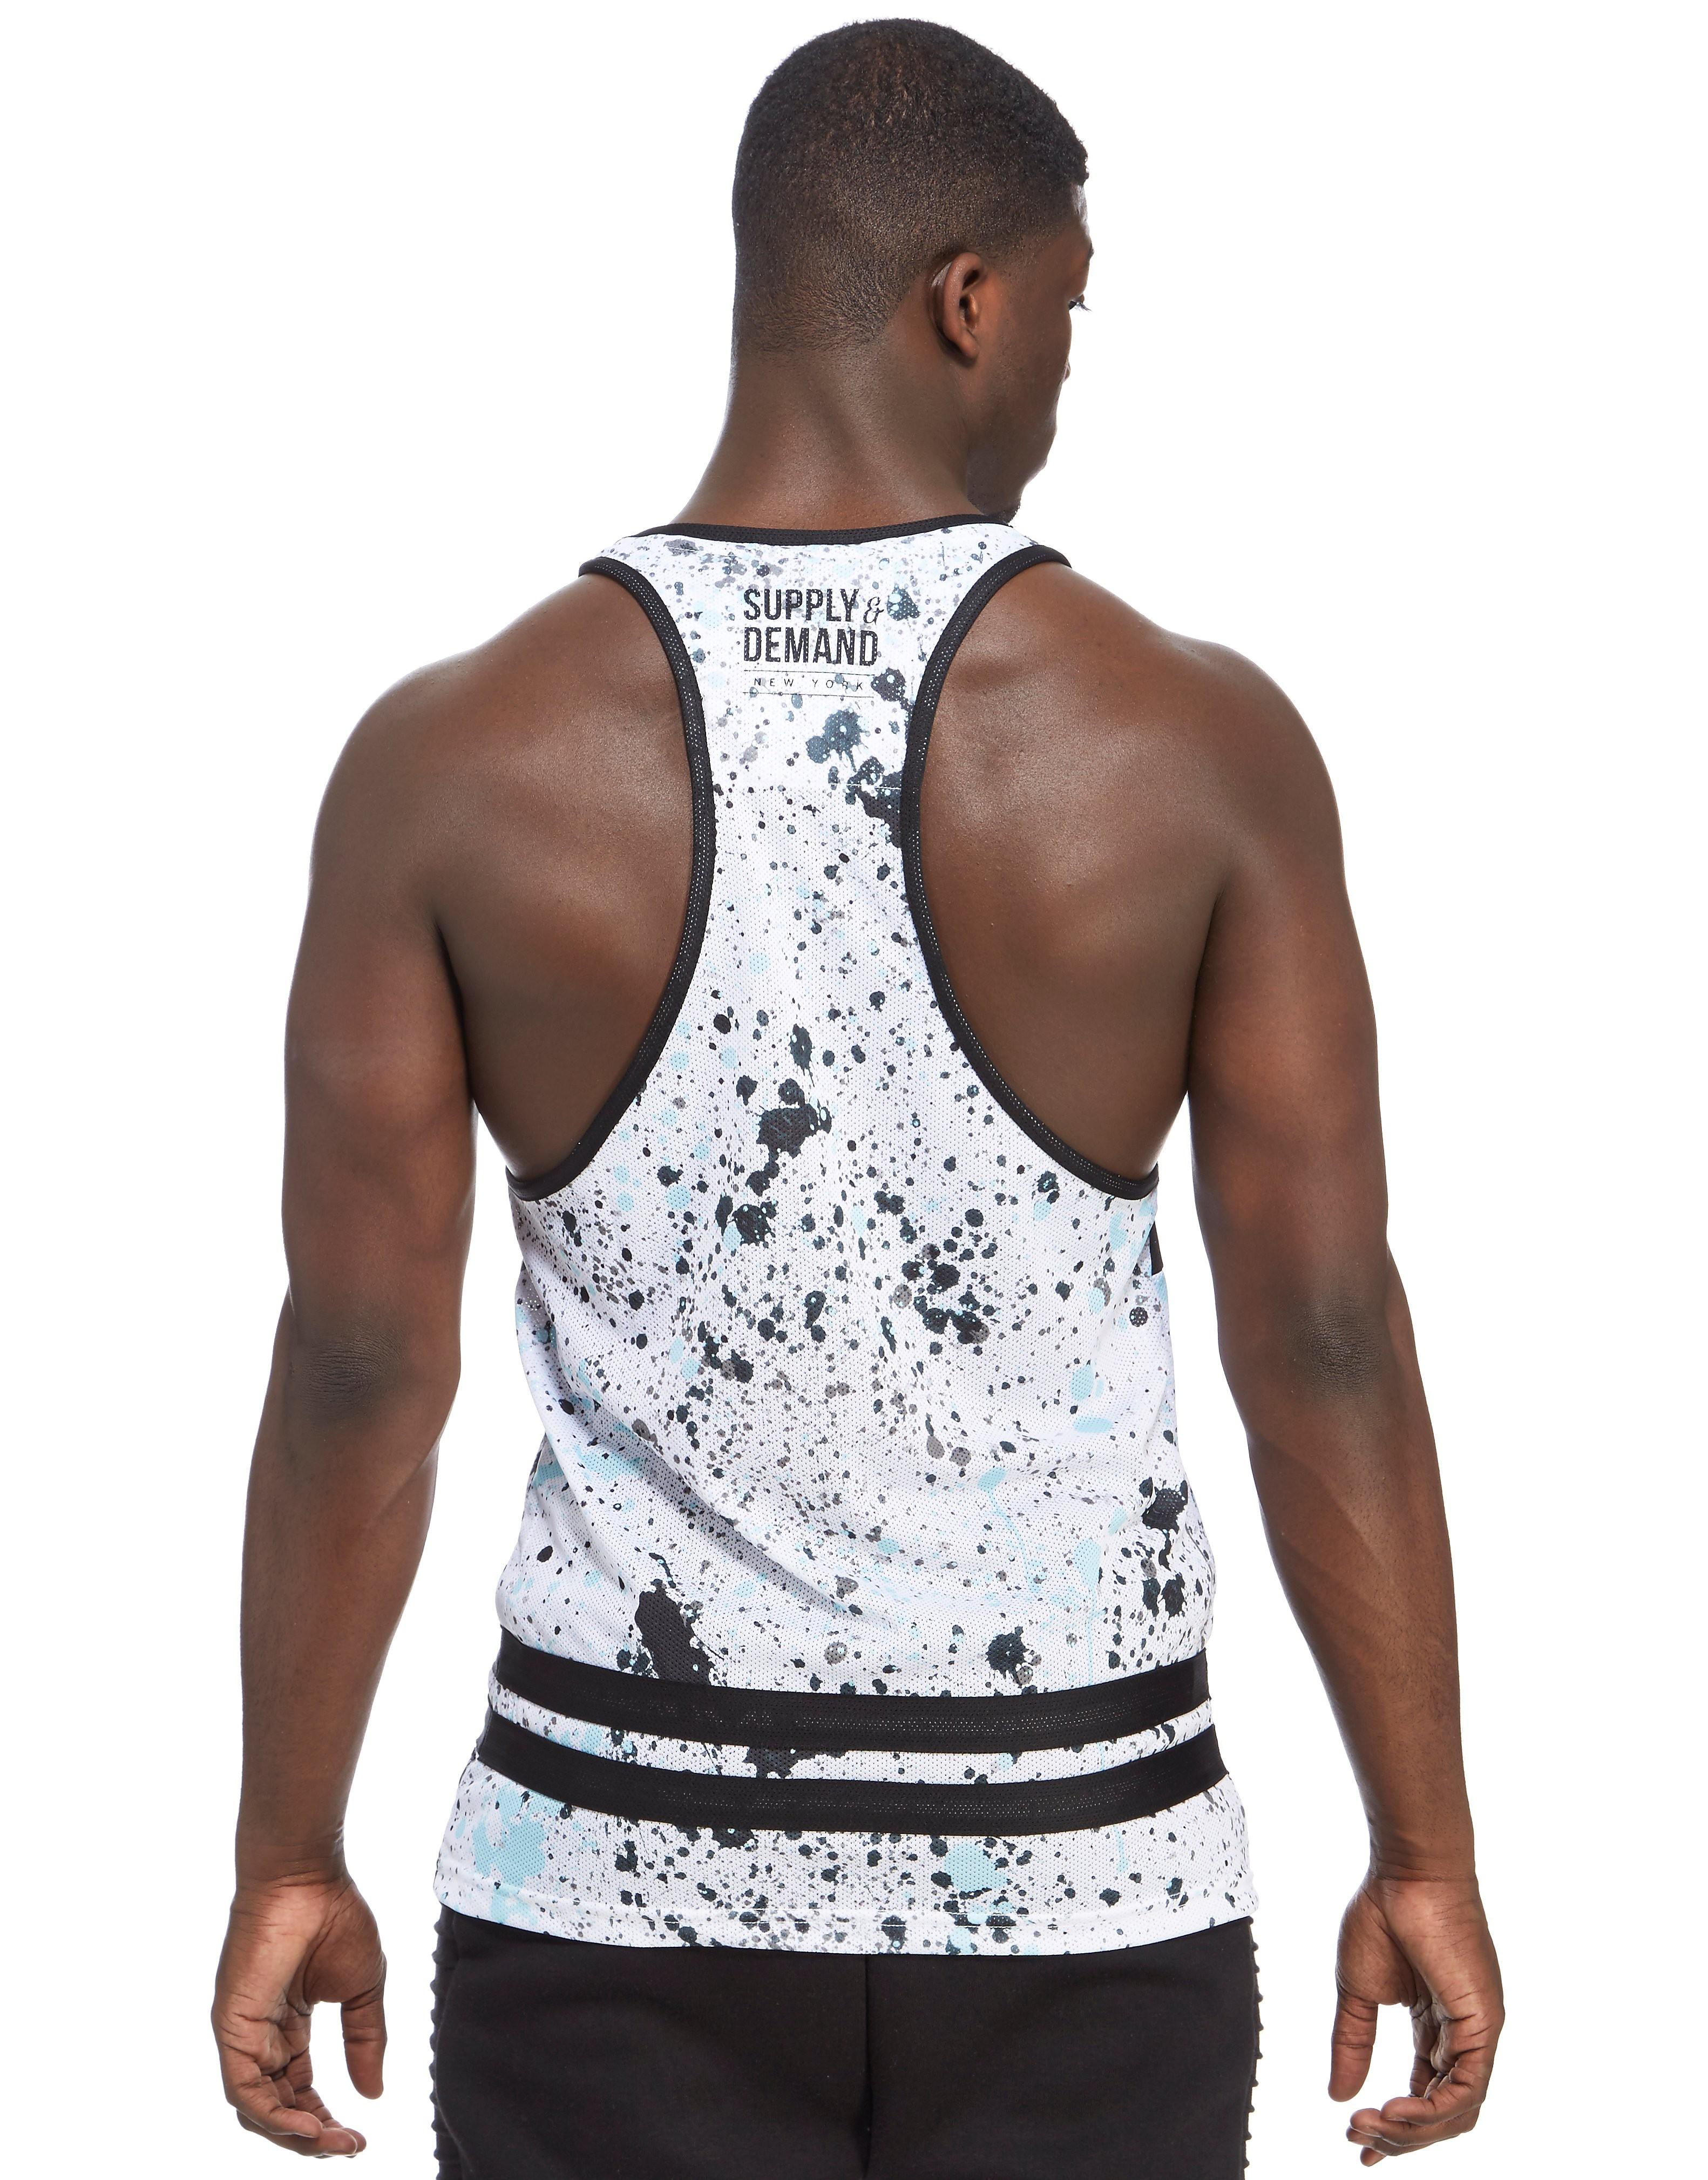 Supply & Demand Drifters Paint Vest